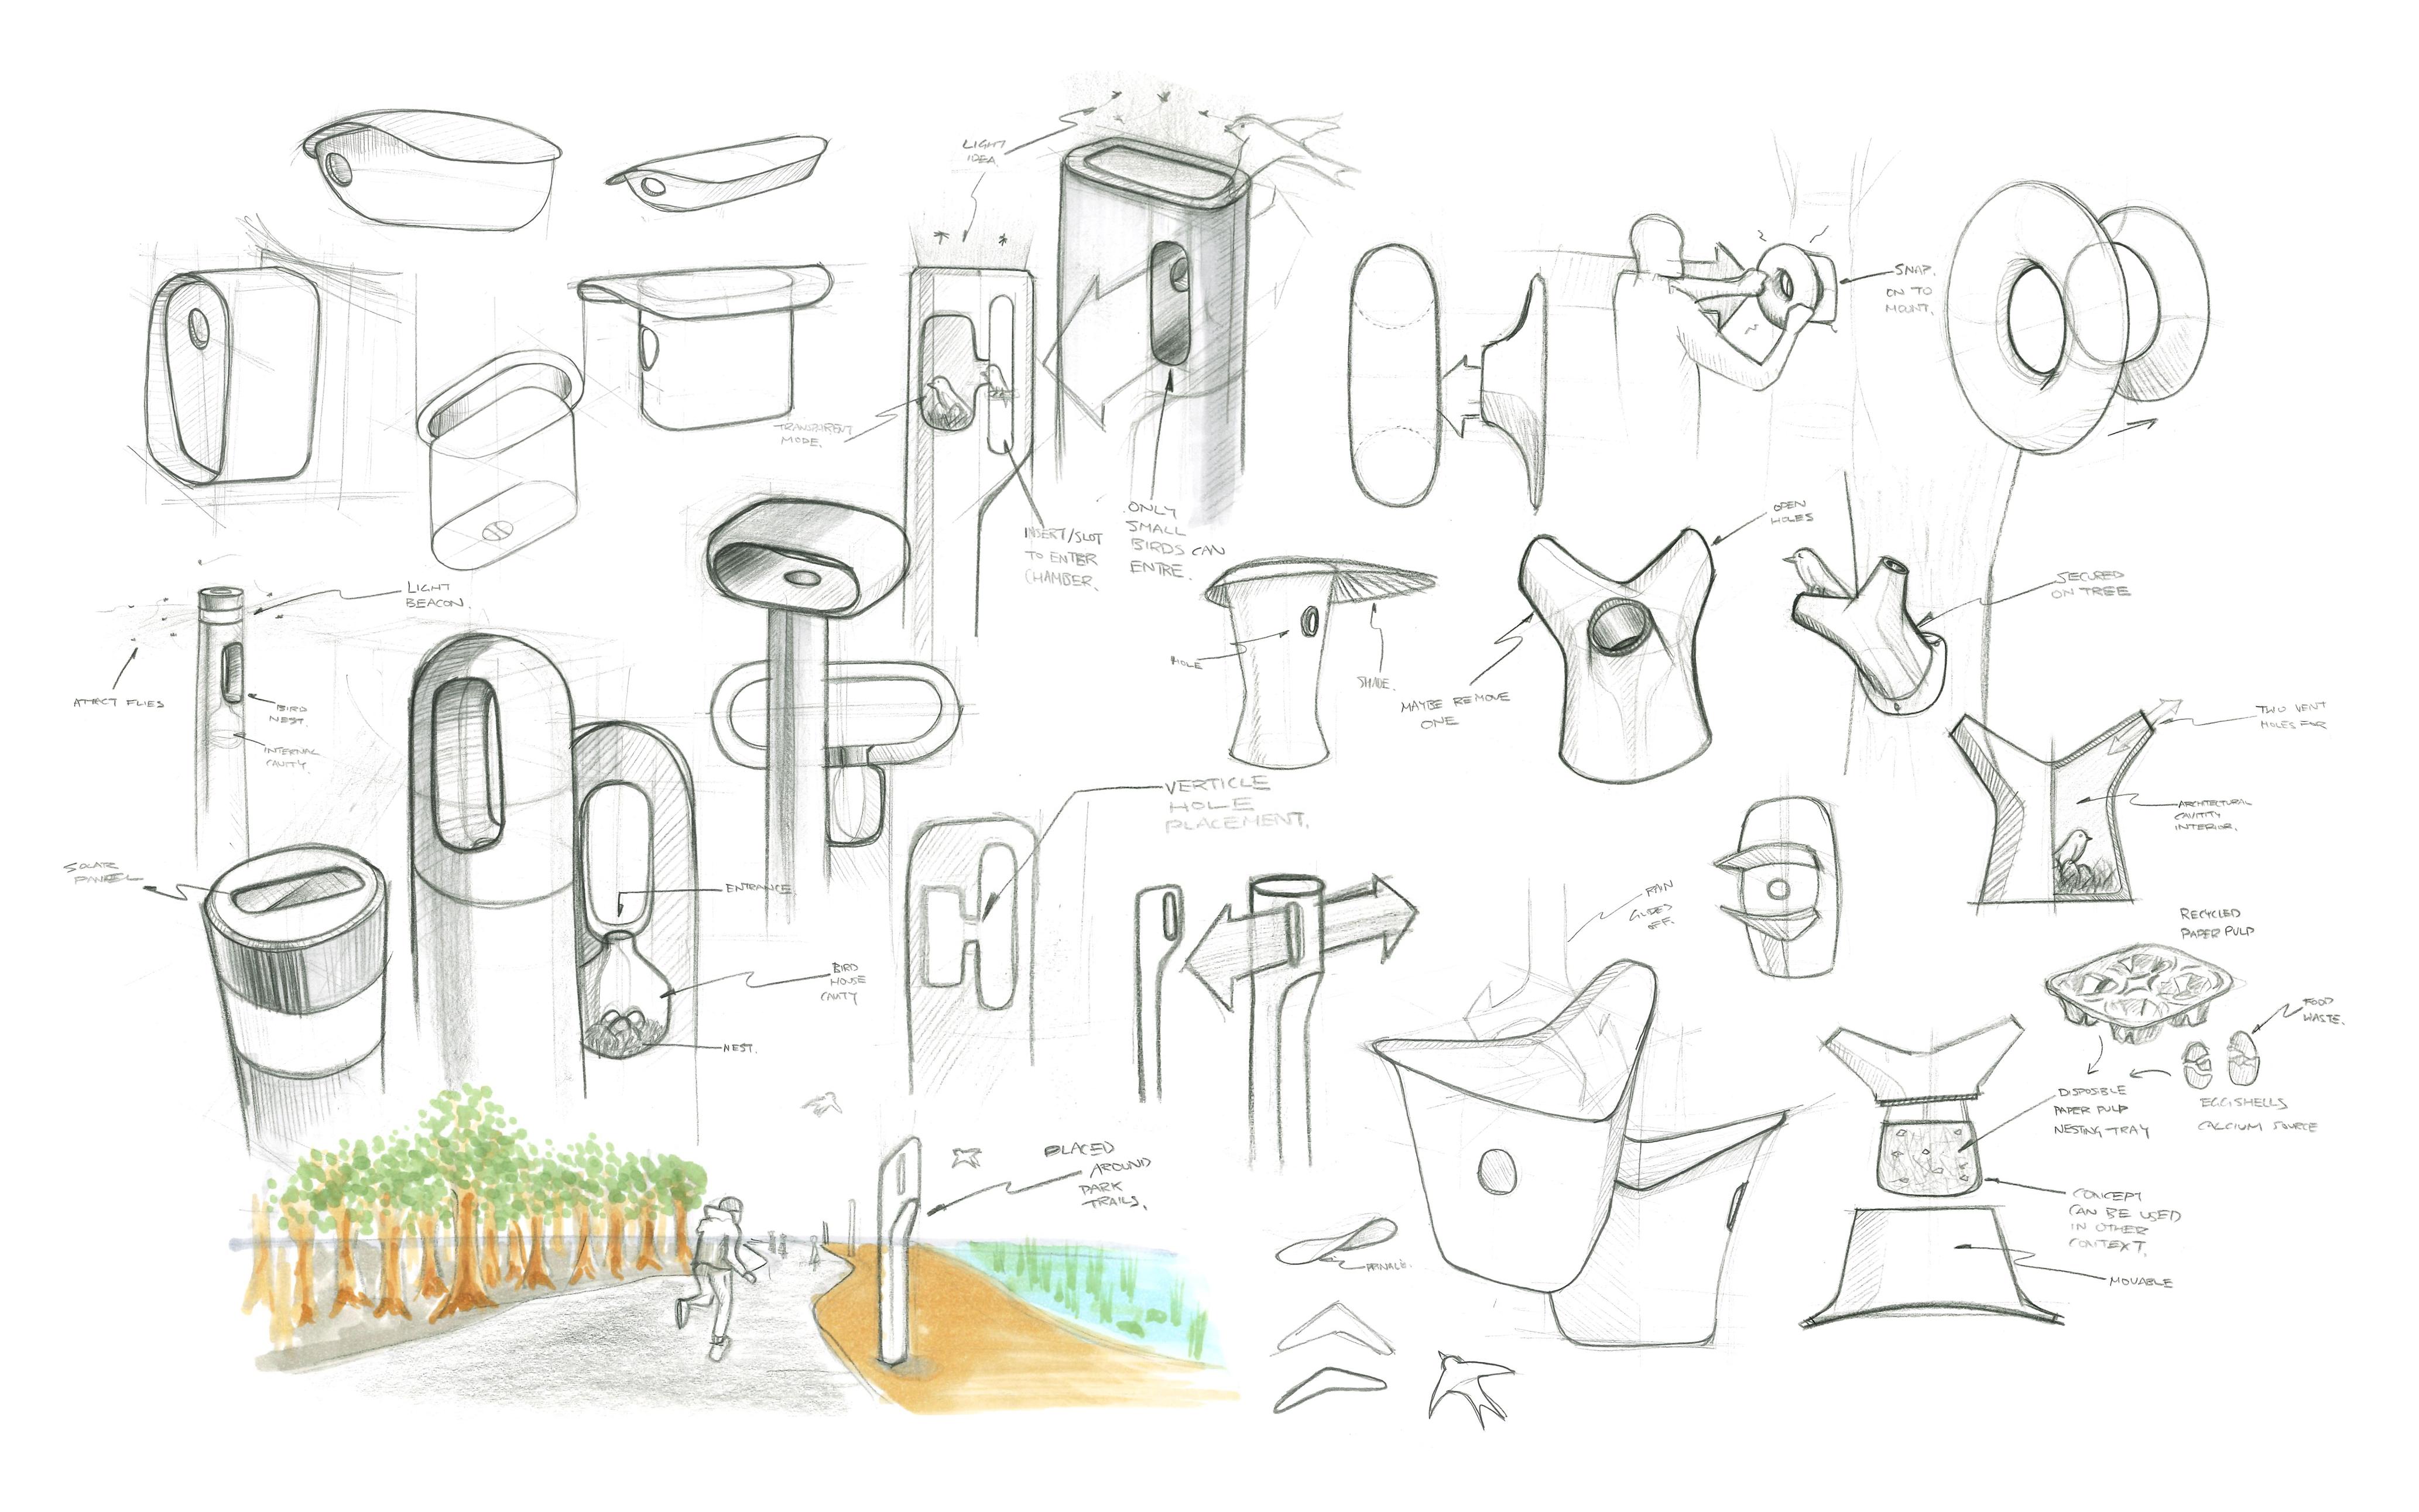 Early developmental sketches